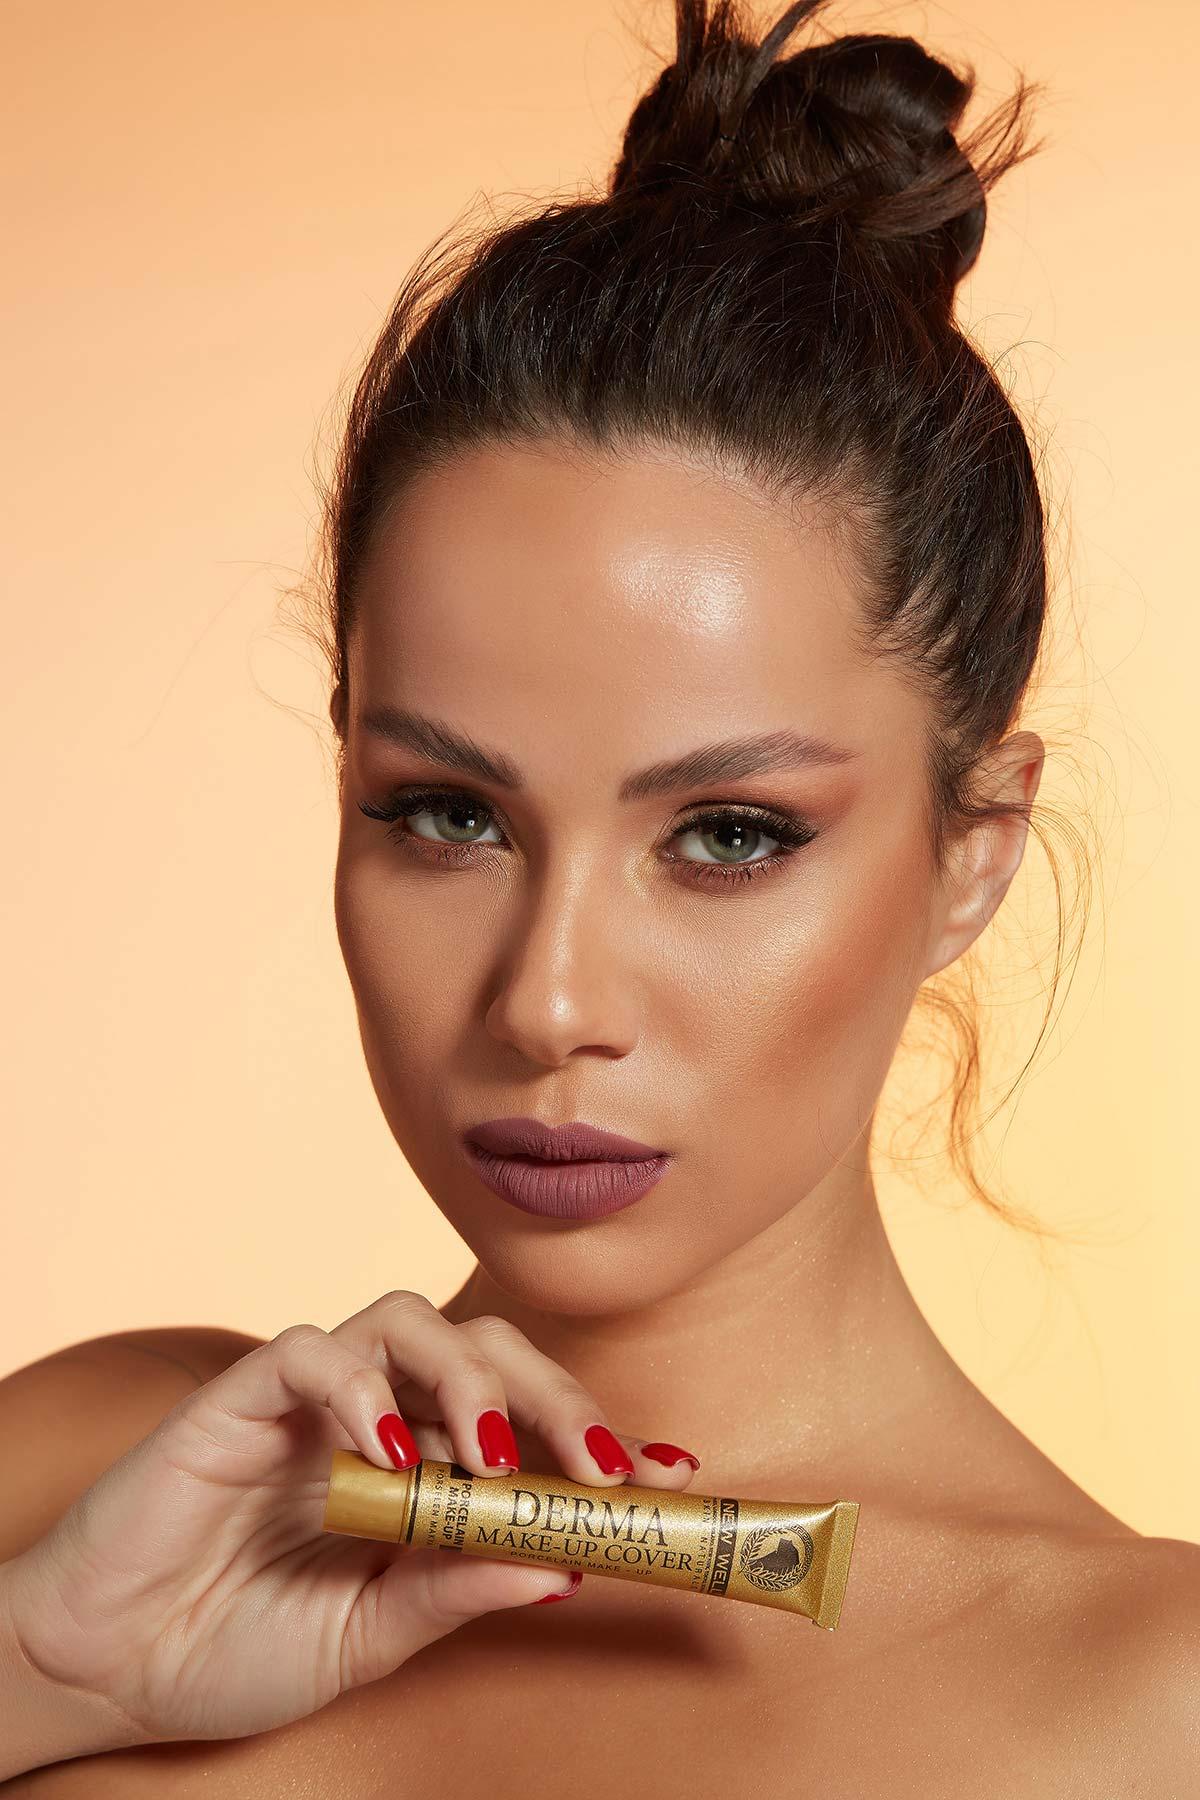 Derma Make-Up Cover Foundation - Silver -Fondöten - Foundation Thumbnail